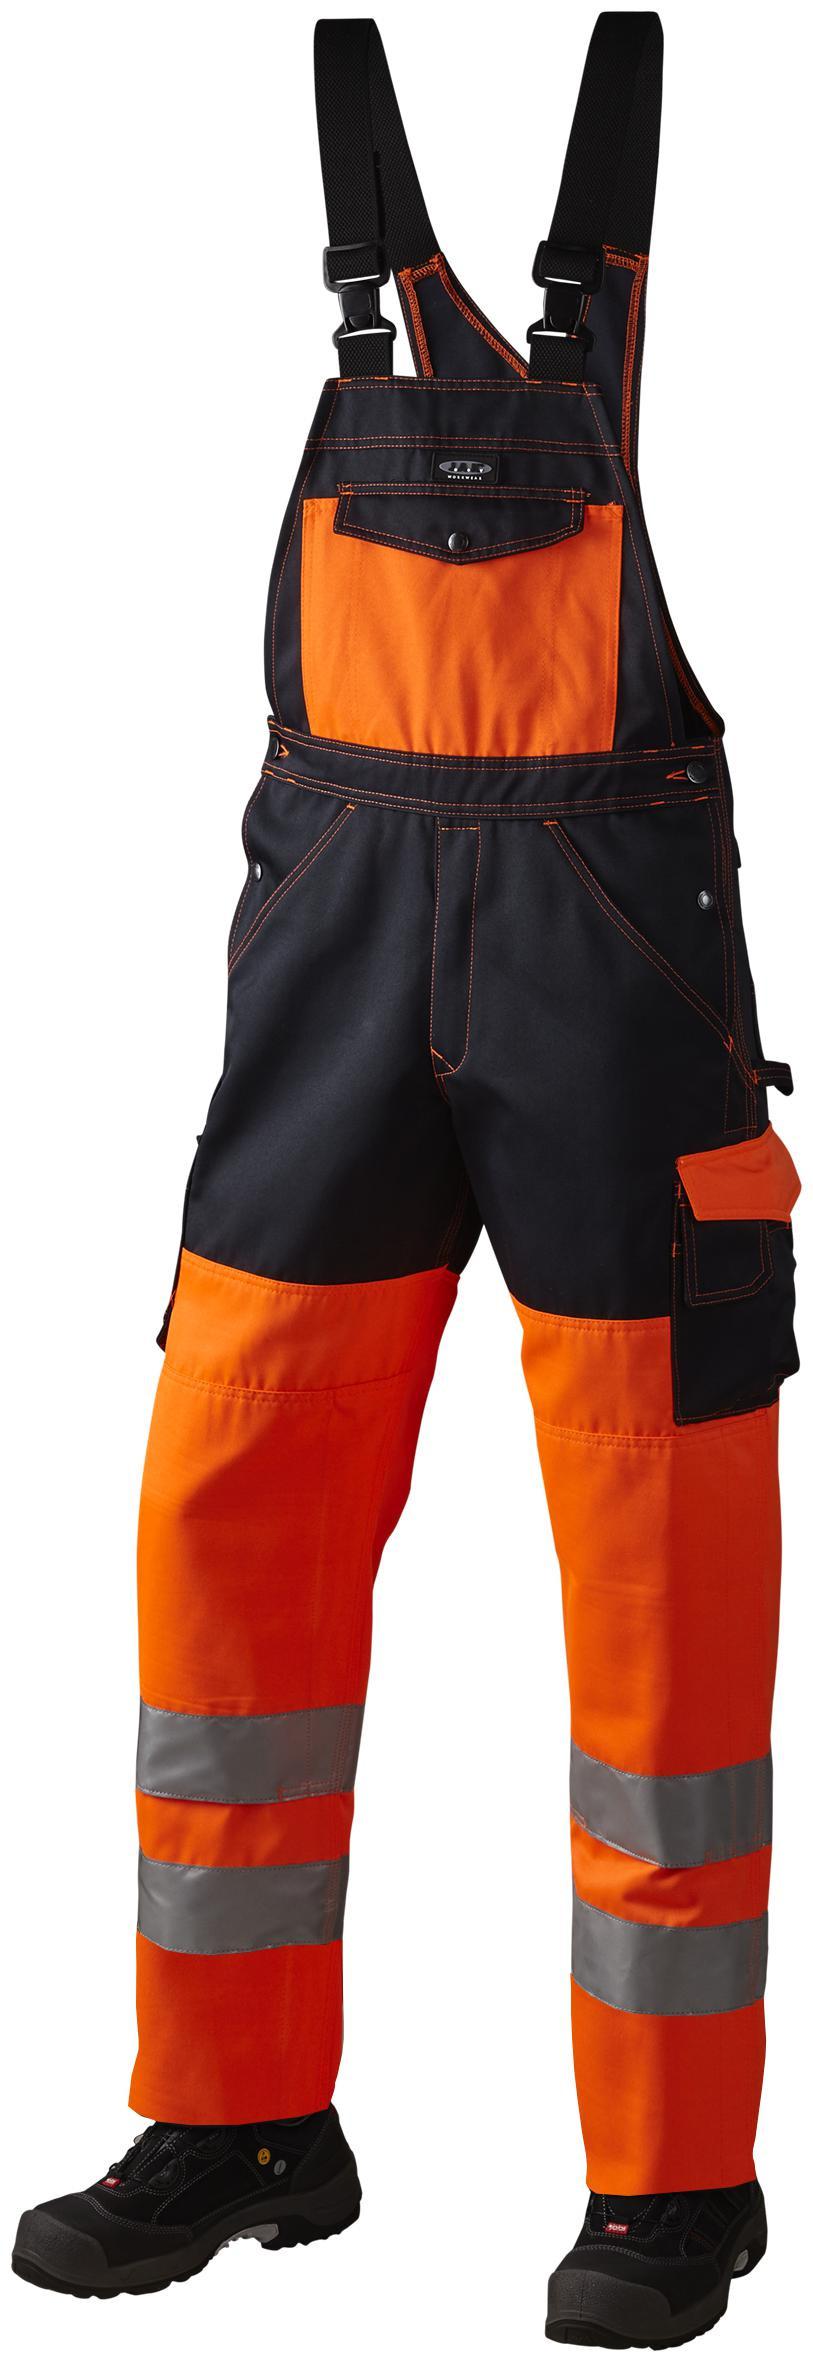 Arbejds overall, HI-VIS, kl. 2, 11107 - Orange/Marine